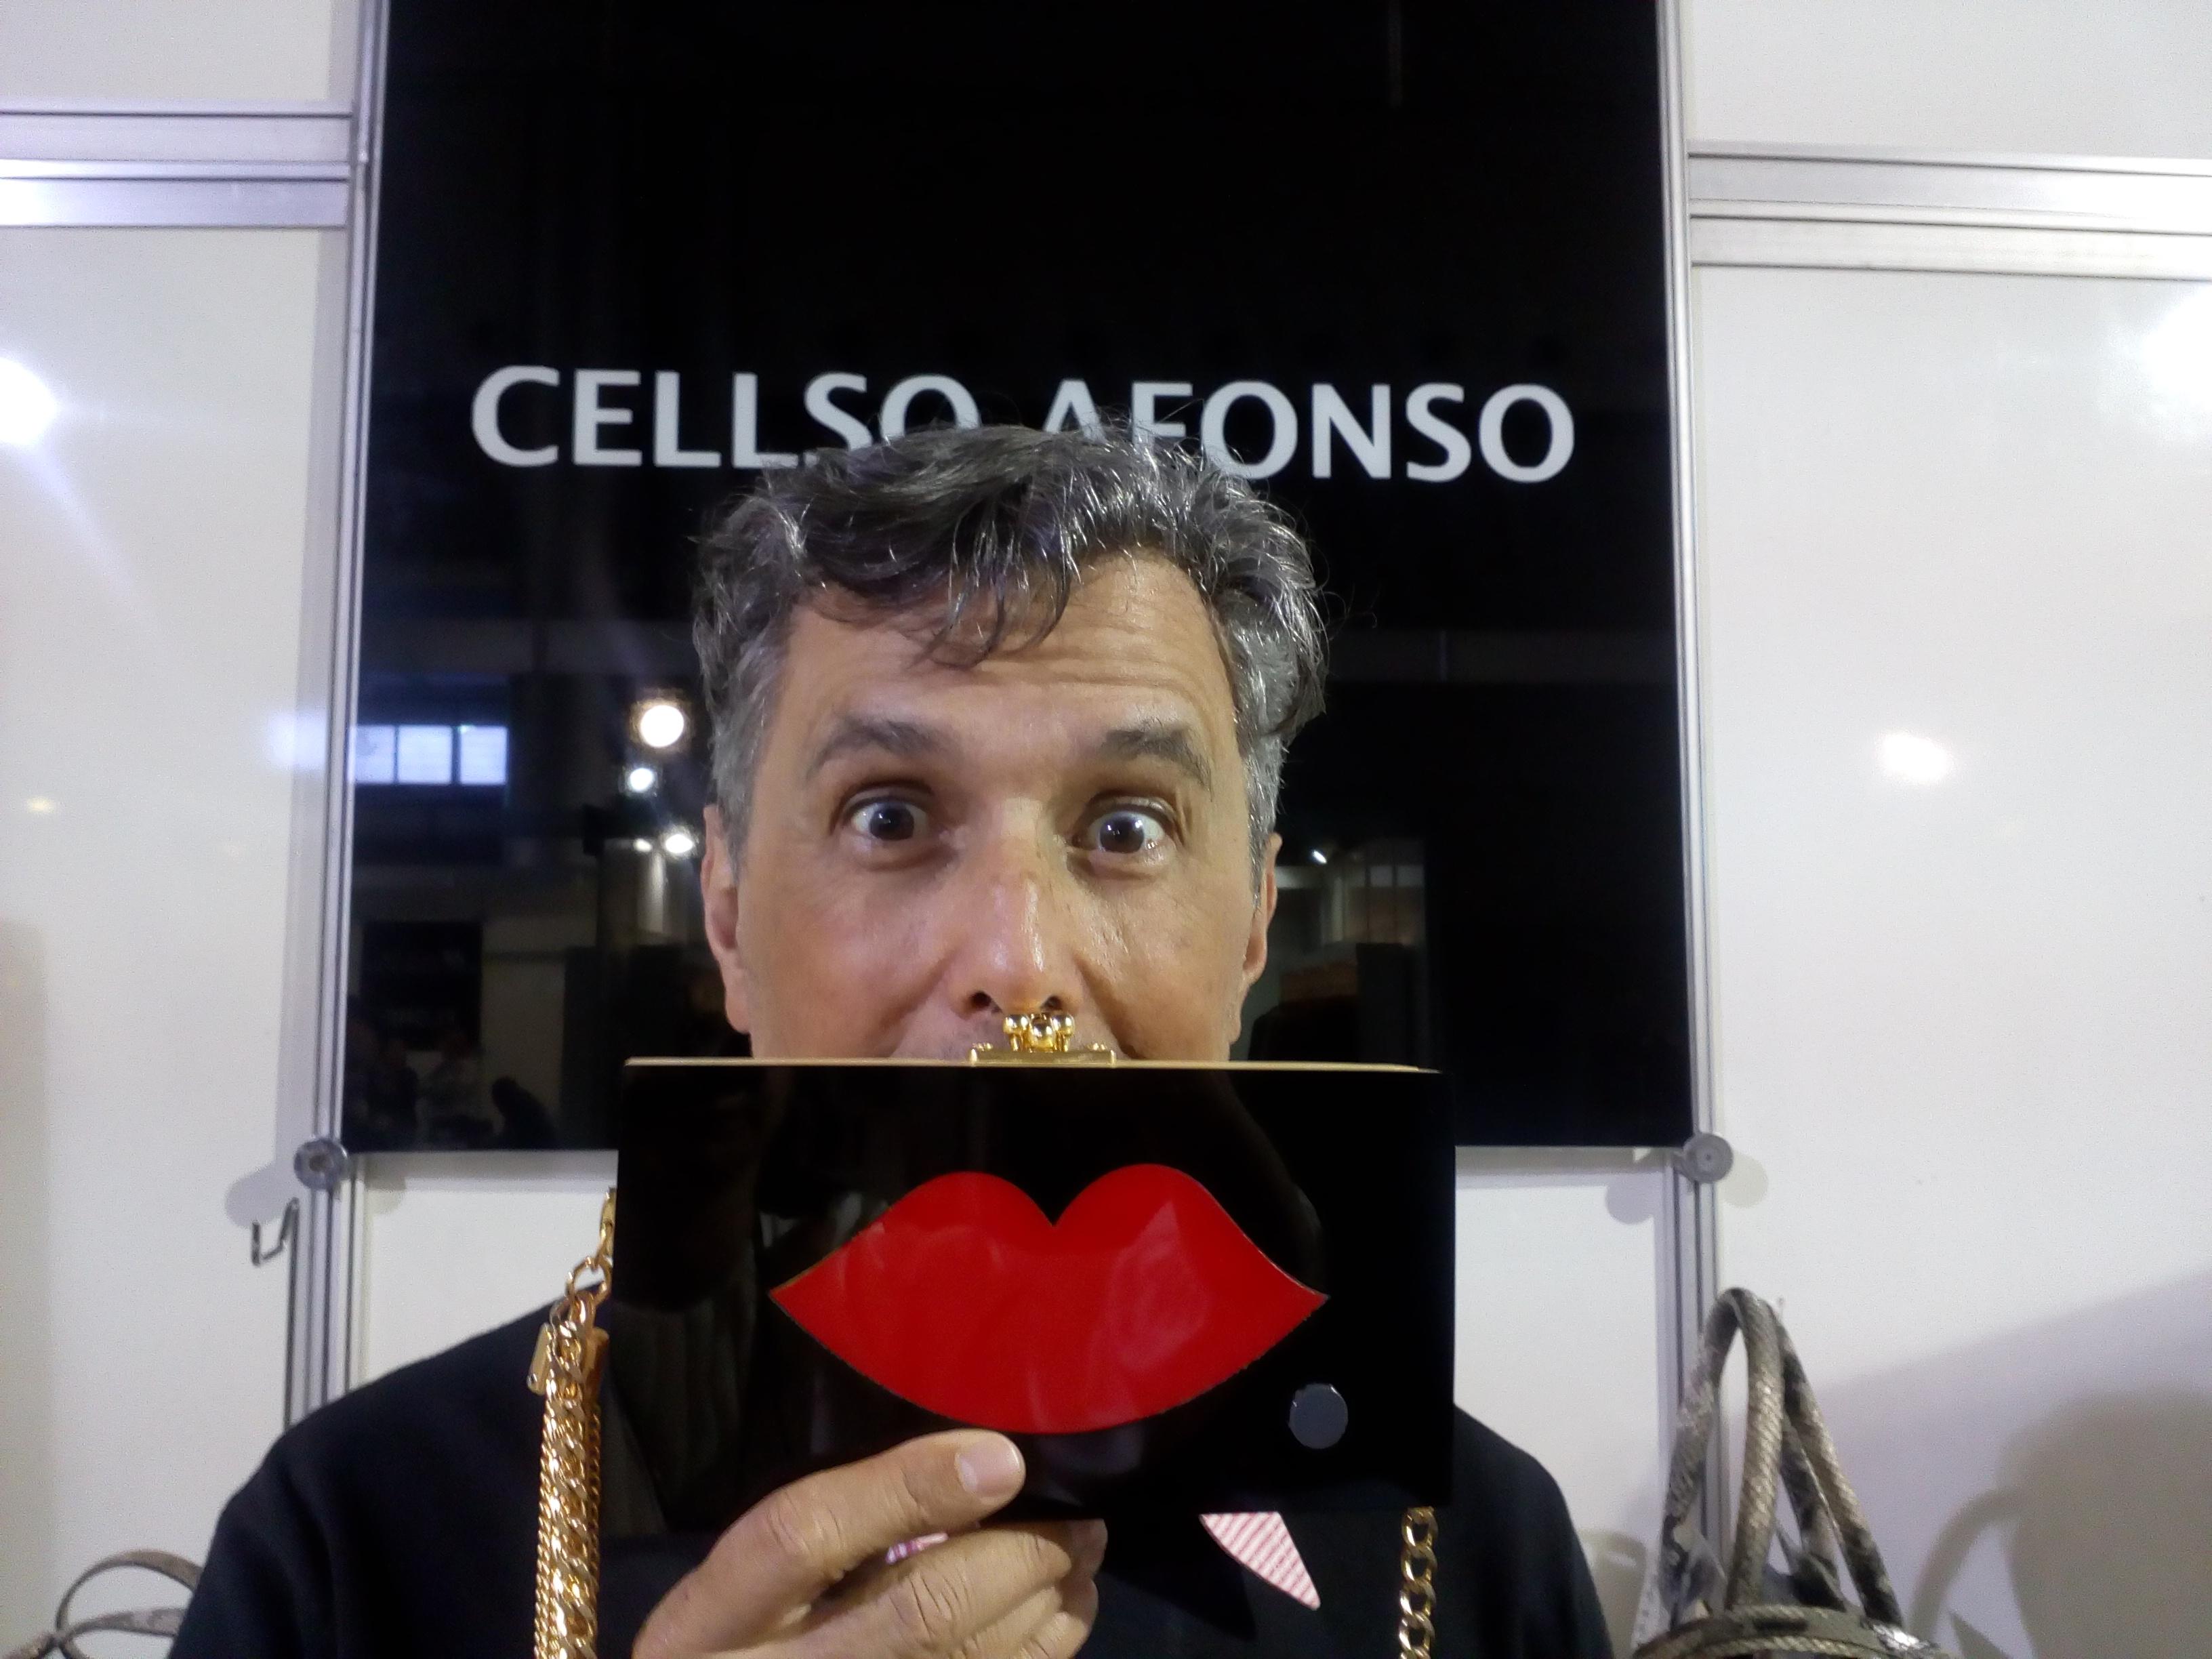 As peças de Cellso Afonso: caixas de surpresa.